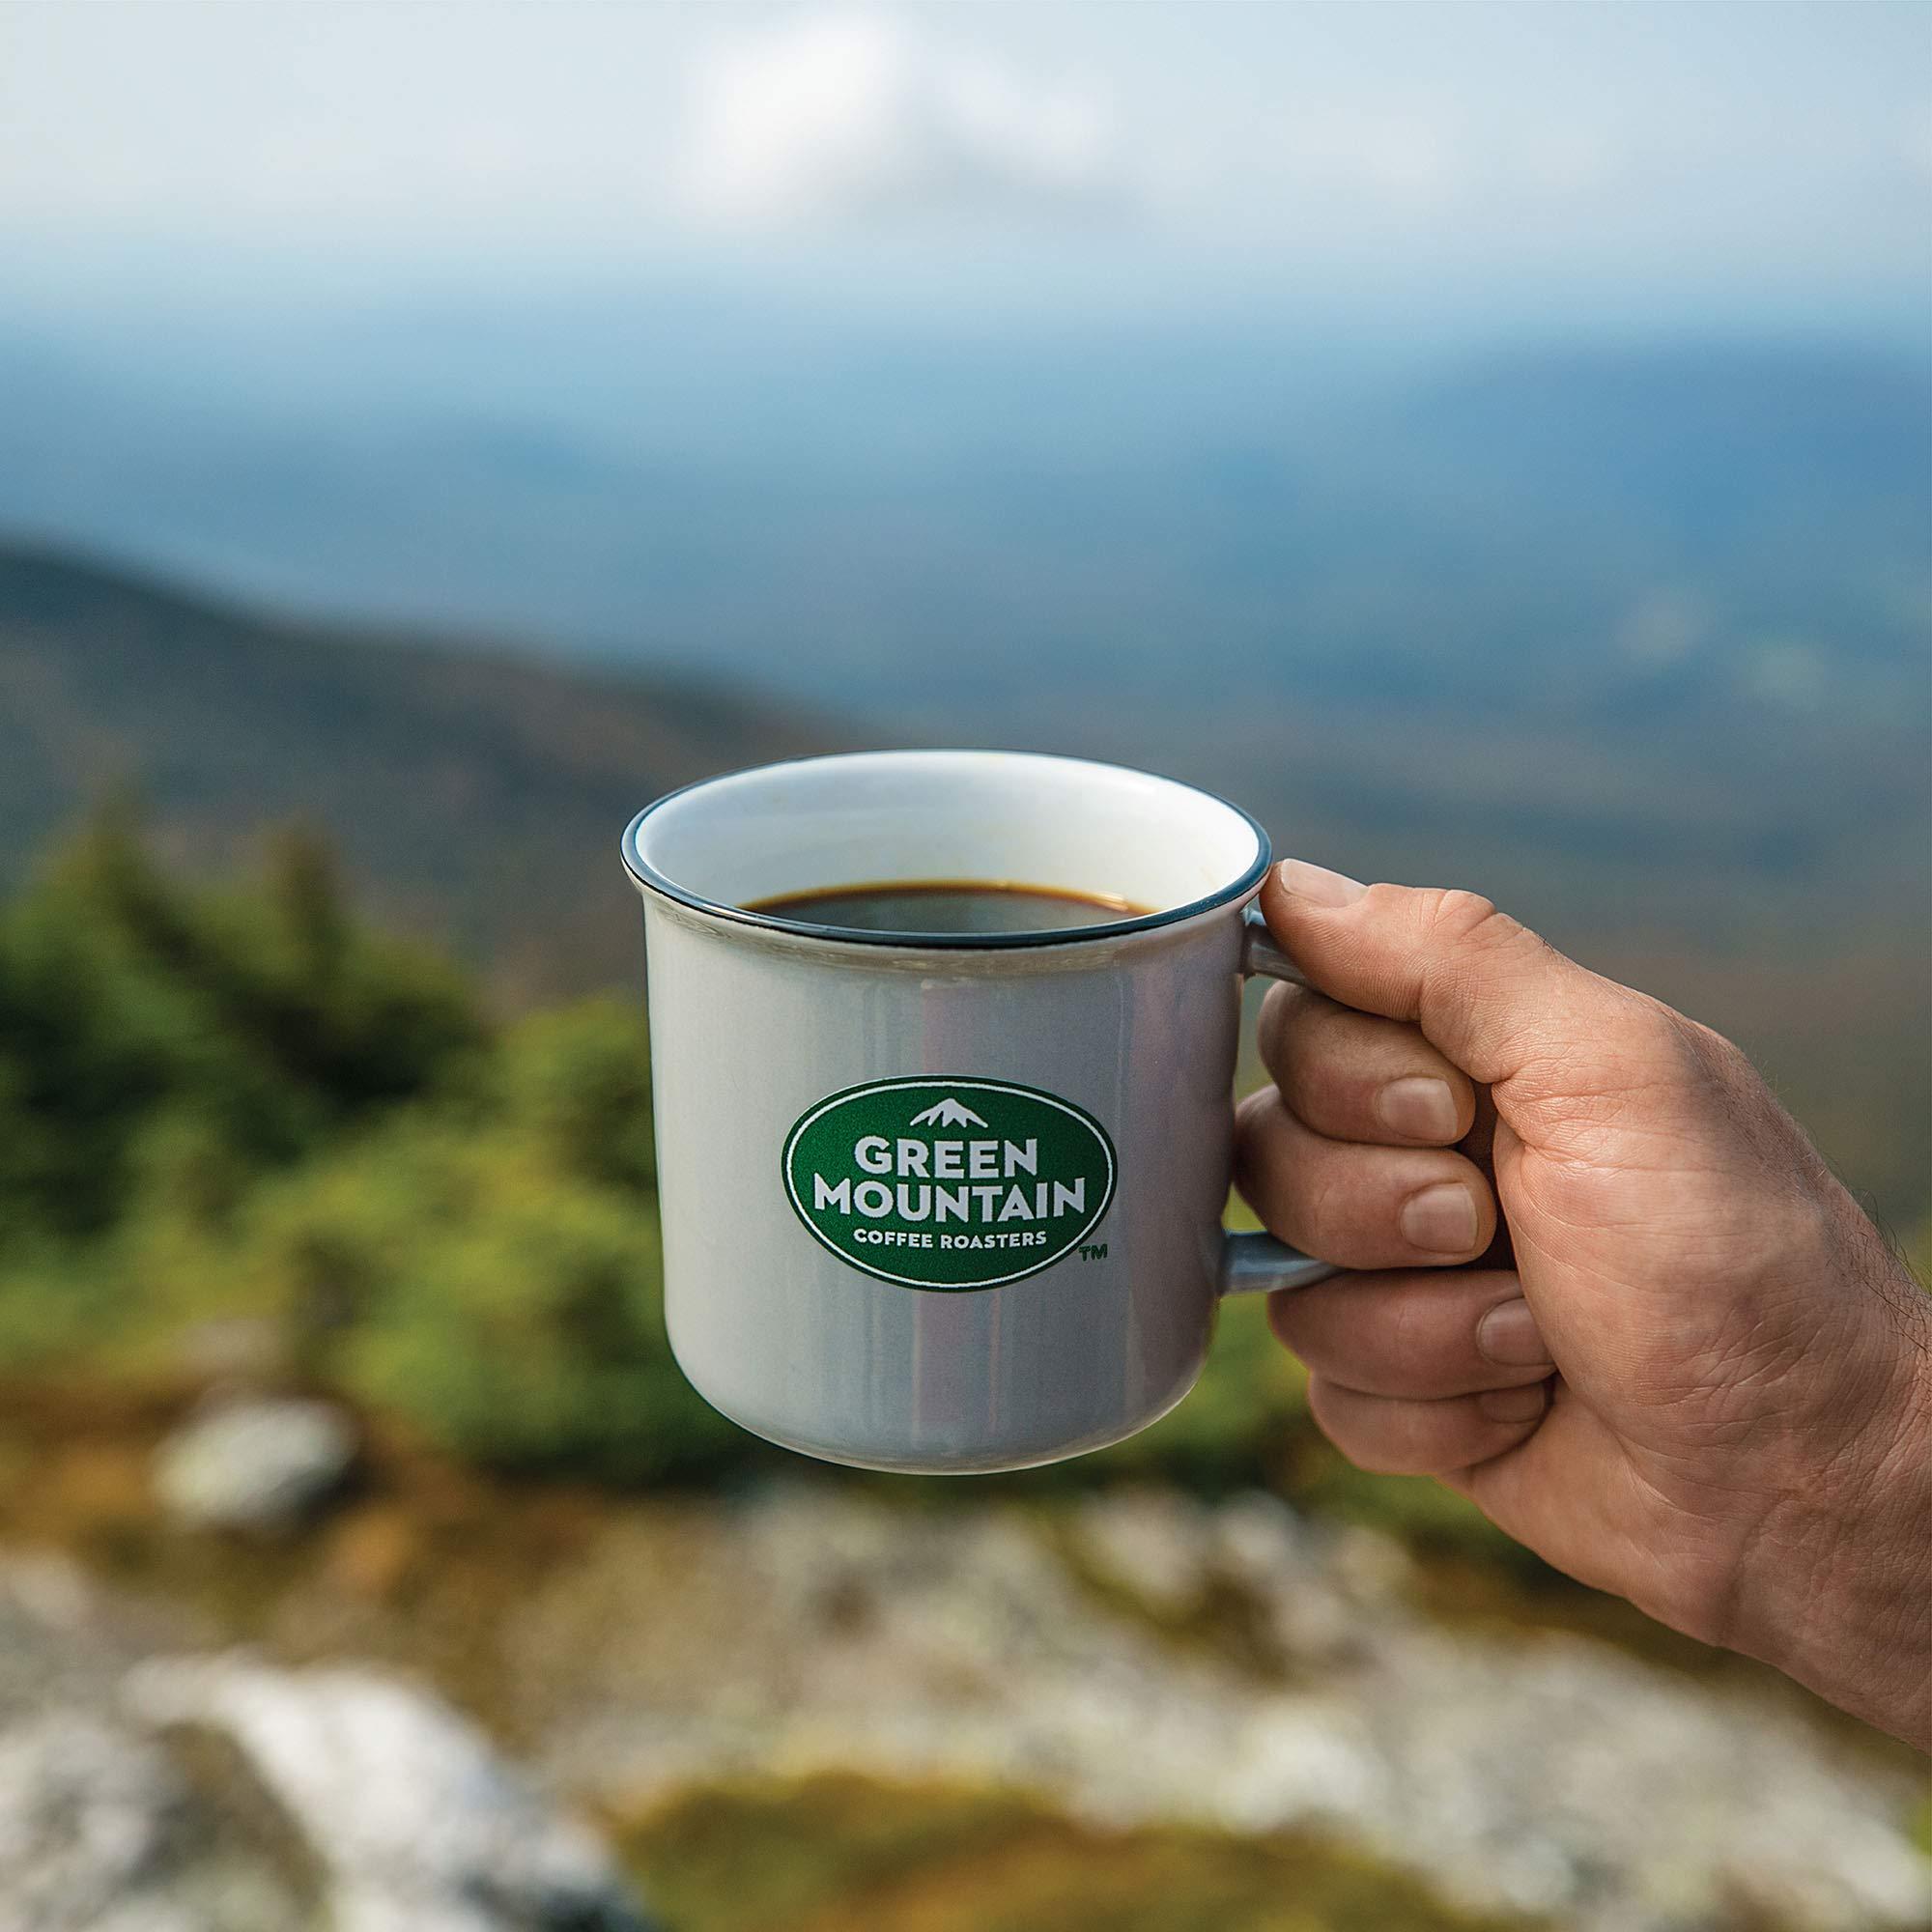 Green Mountain Coffee Roasters  Maple Pecan, 96 Count by Green Mountain Coffee Roasters (Image #5)